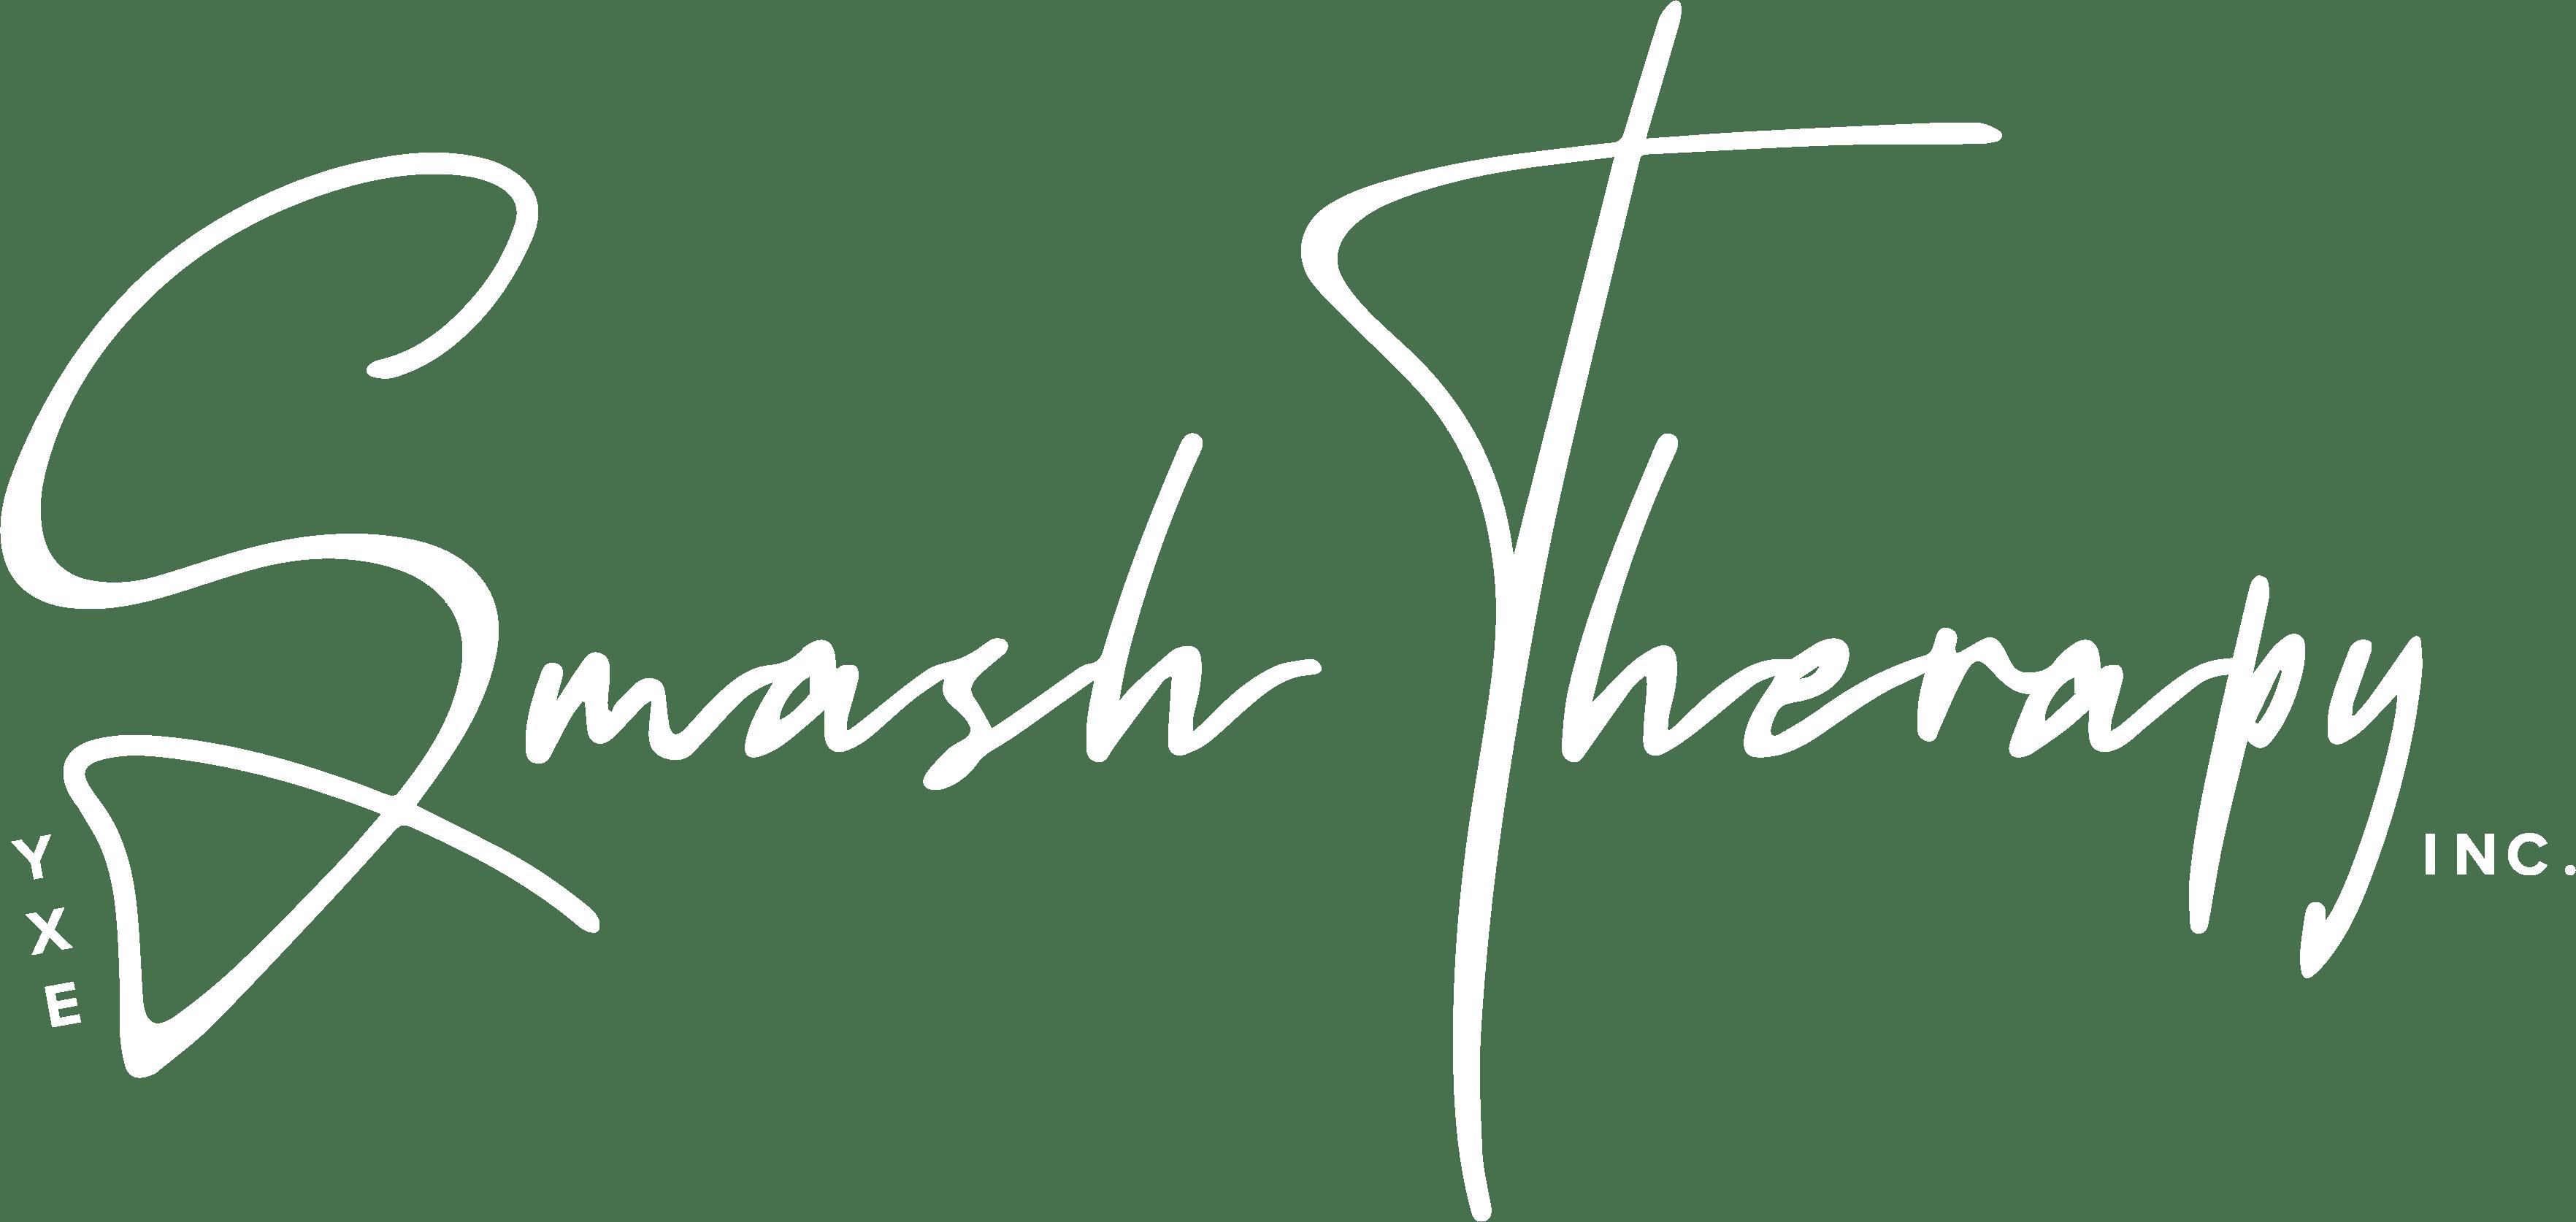 Yxe Smash Therapy Inc